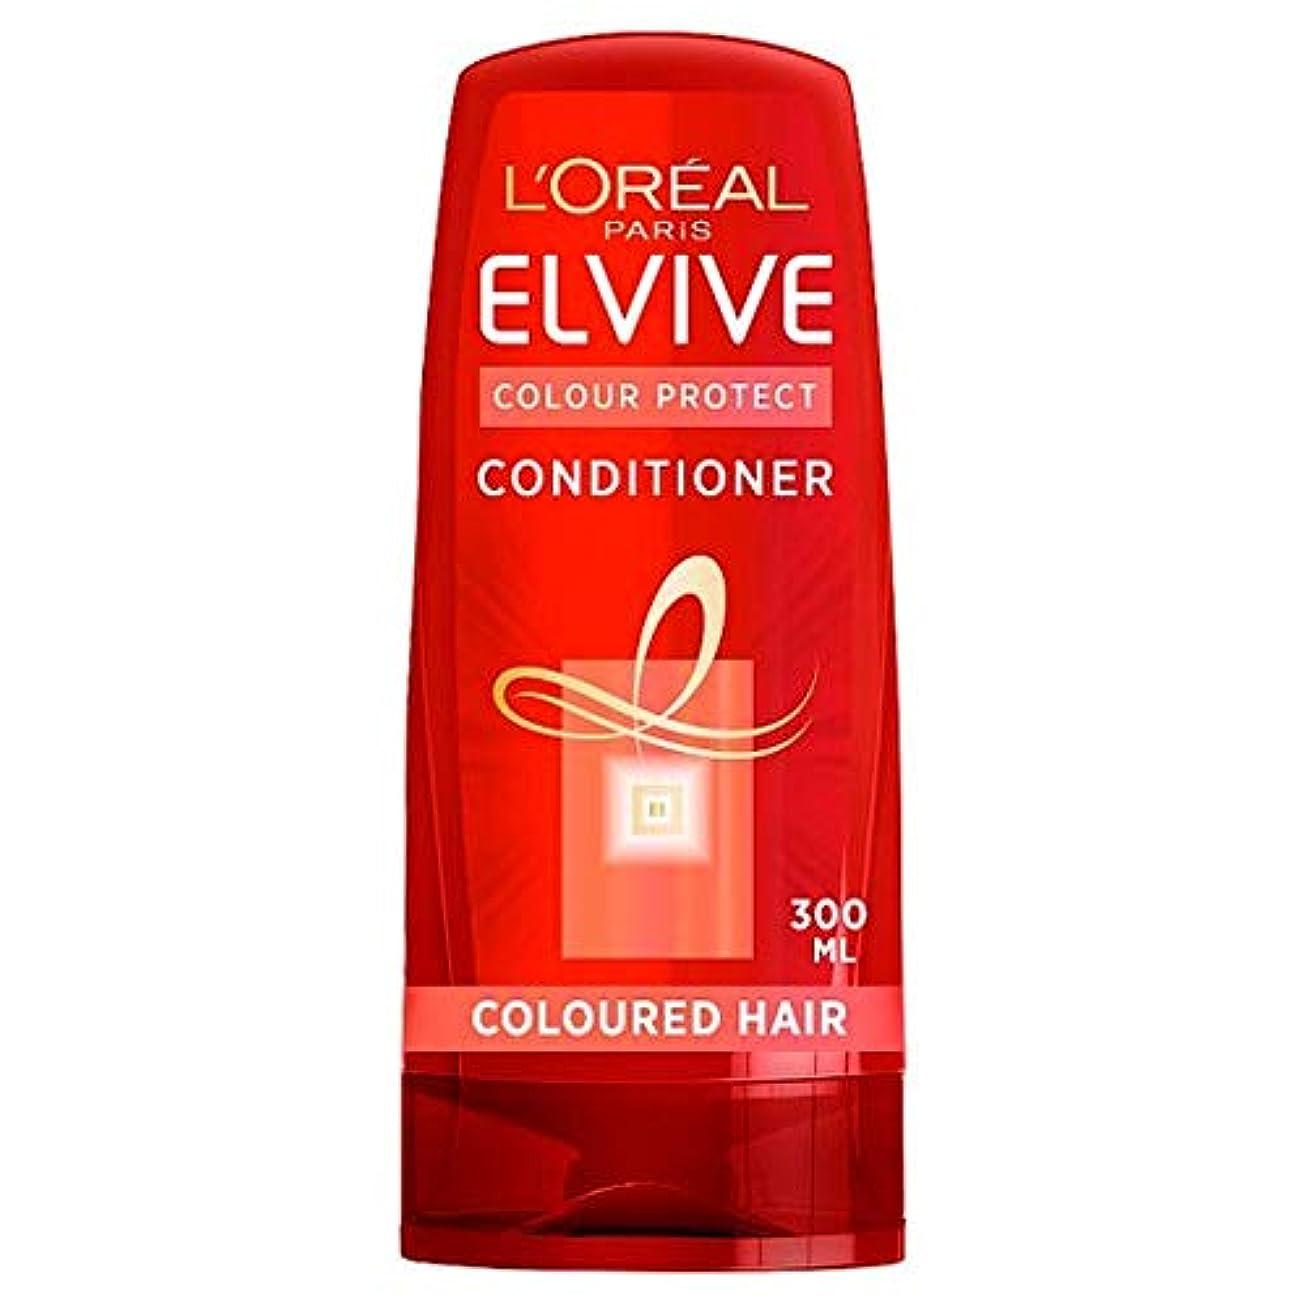 [Elvive] ロレアルElvive色の保護ヘアコンディショナー300ミリリットル - L'oreal Elvive Coloured Protection Hair Conditioner 300Ml [並行輸入品]